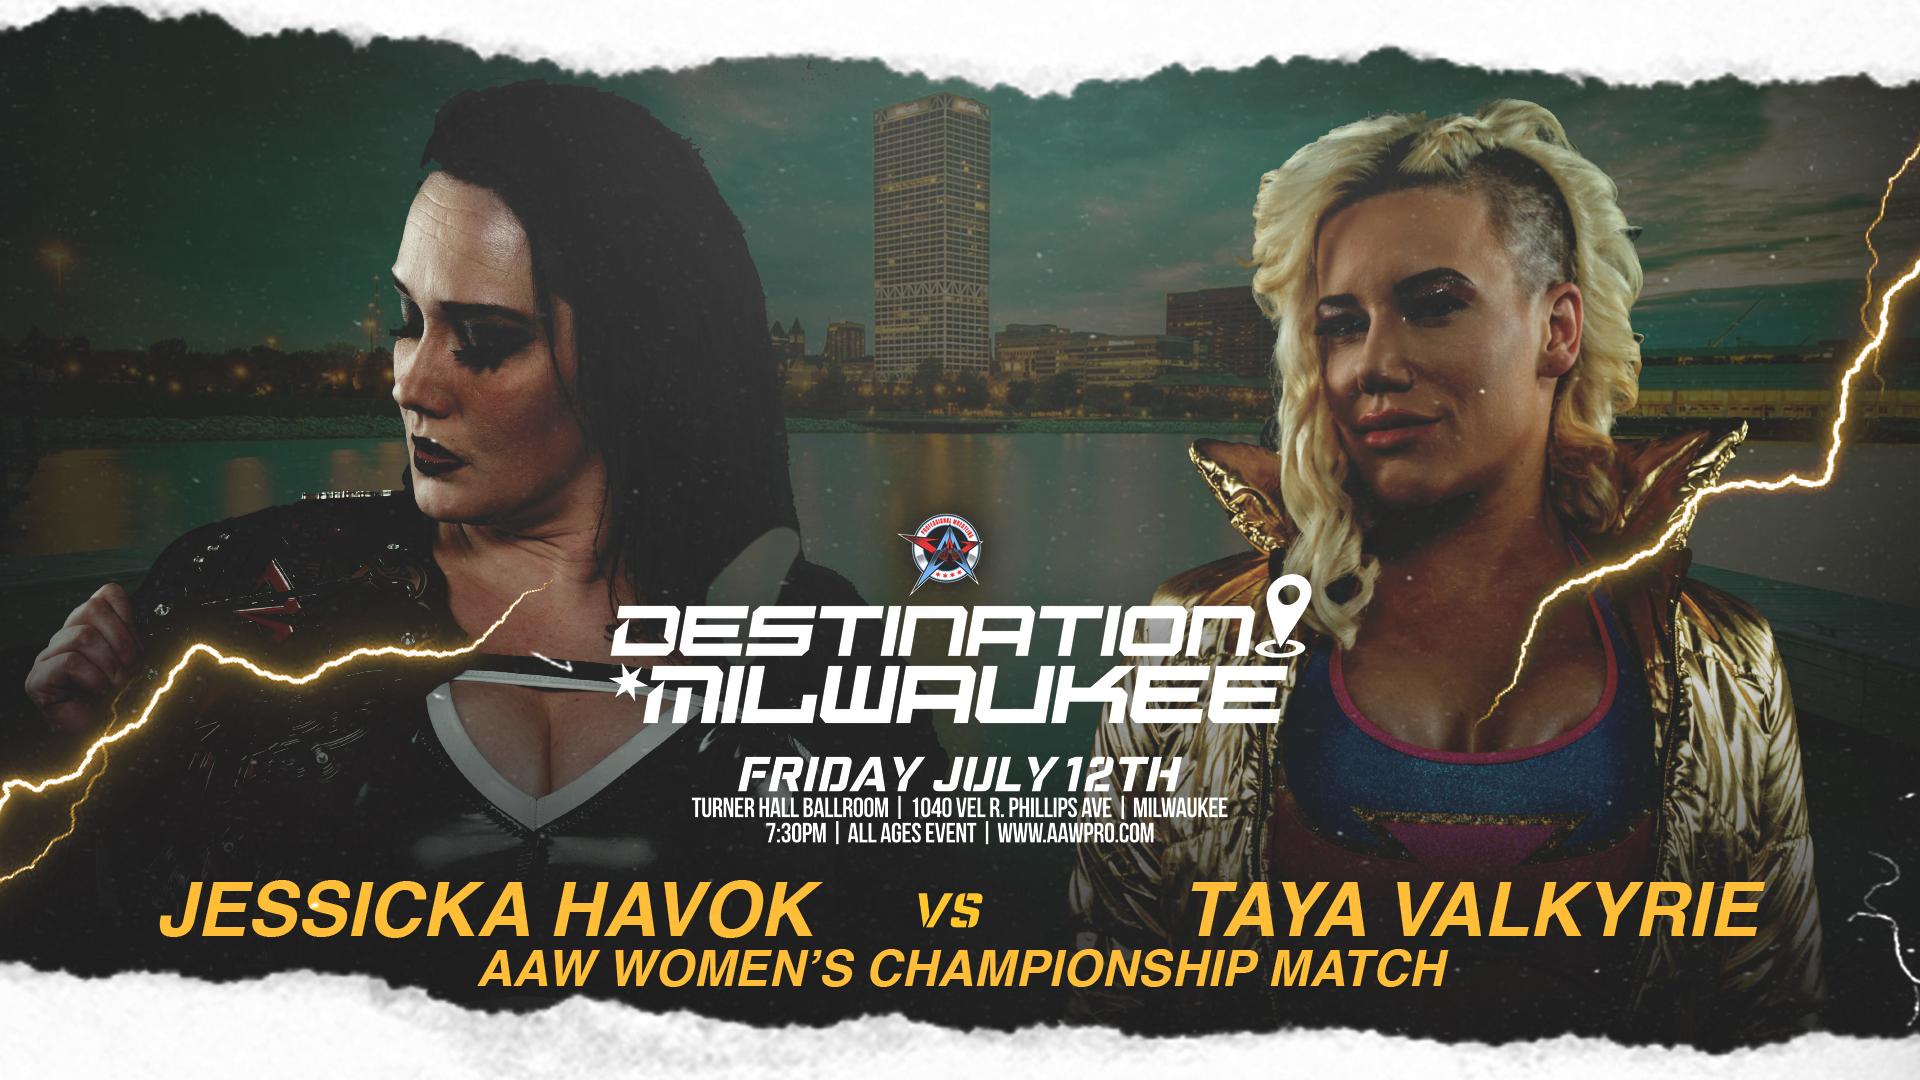 Women's Championship Match Signed for Destination Milwaukee